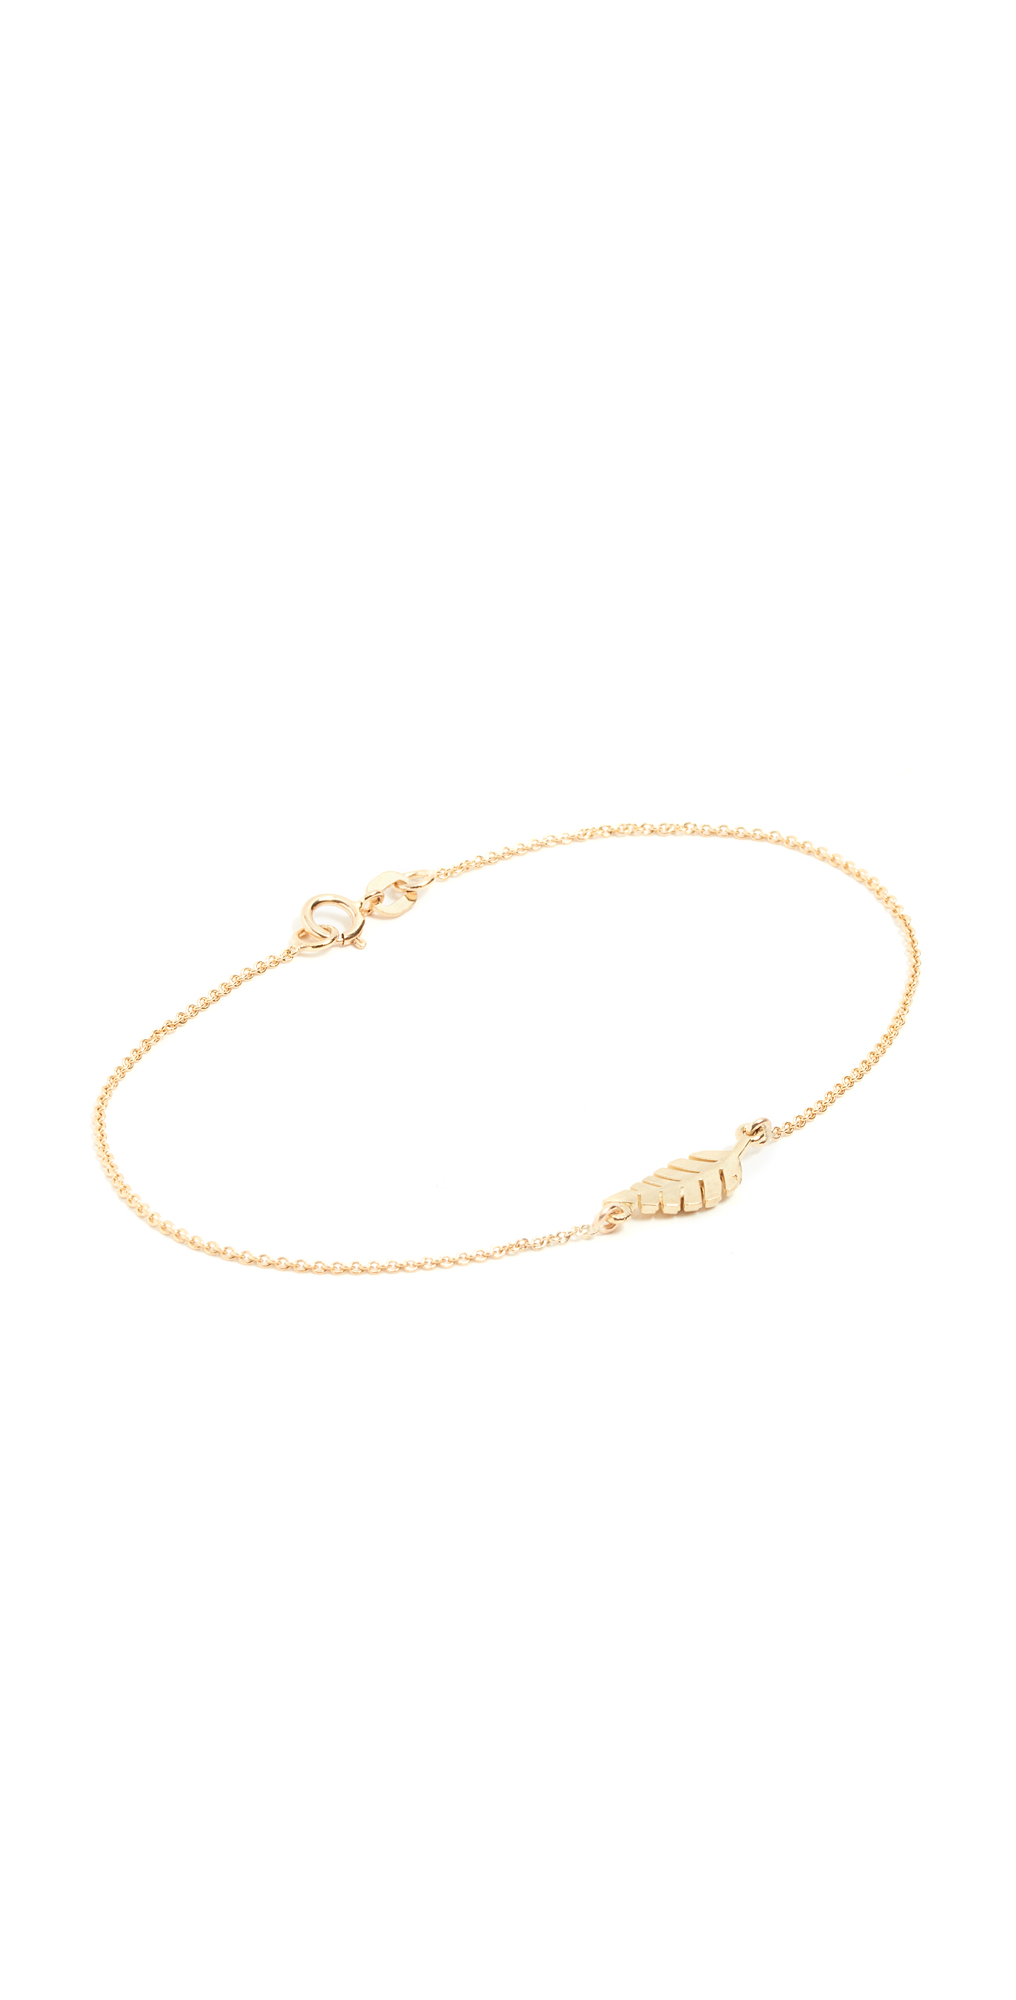 Jennifer Meyer Jewelry 18k Gold Mini Leaf Bracelet